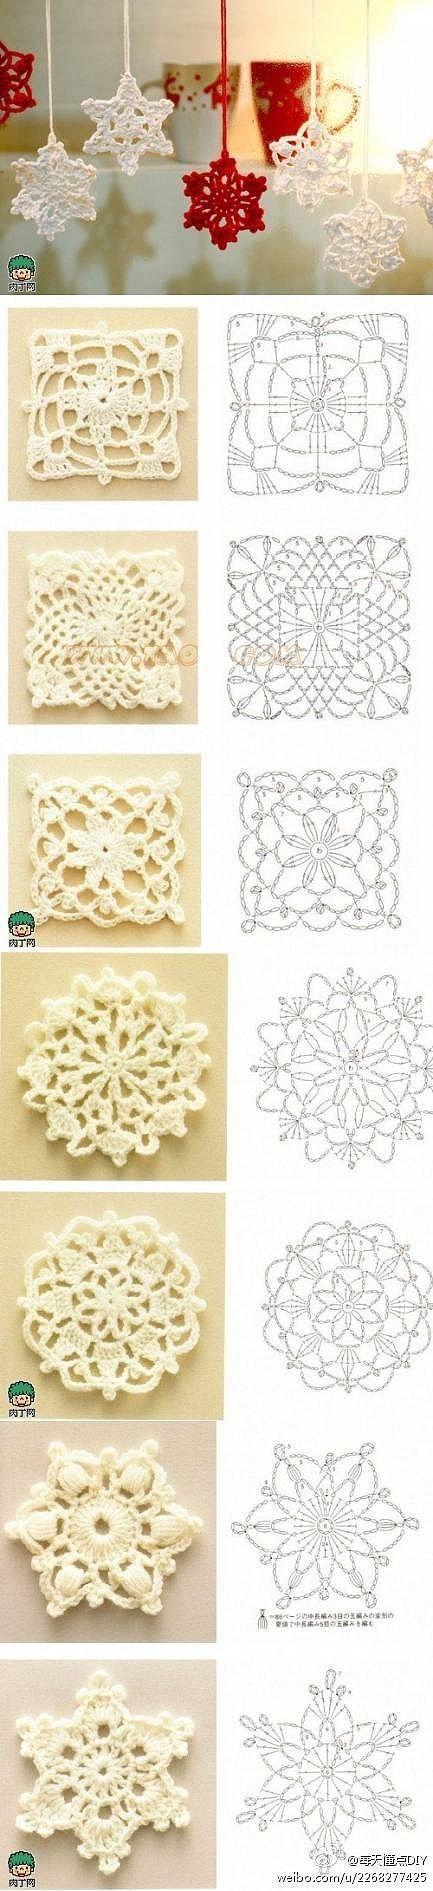 Snowflakes by nicolson.araya